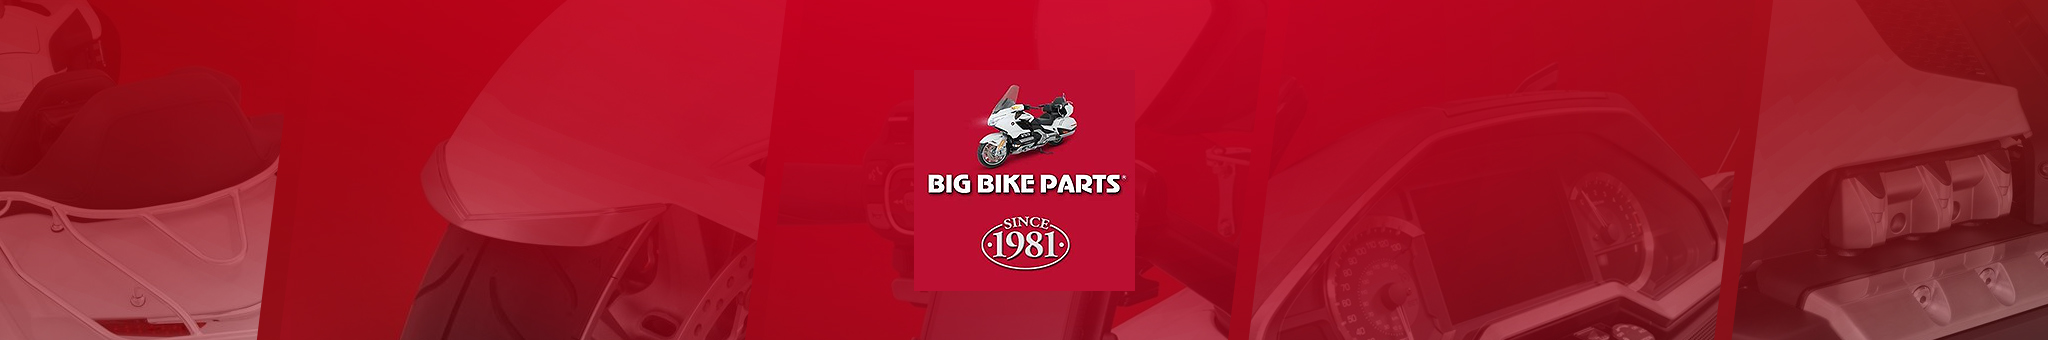 Big Bike Parts - APPSeCONNECT